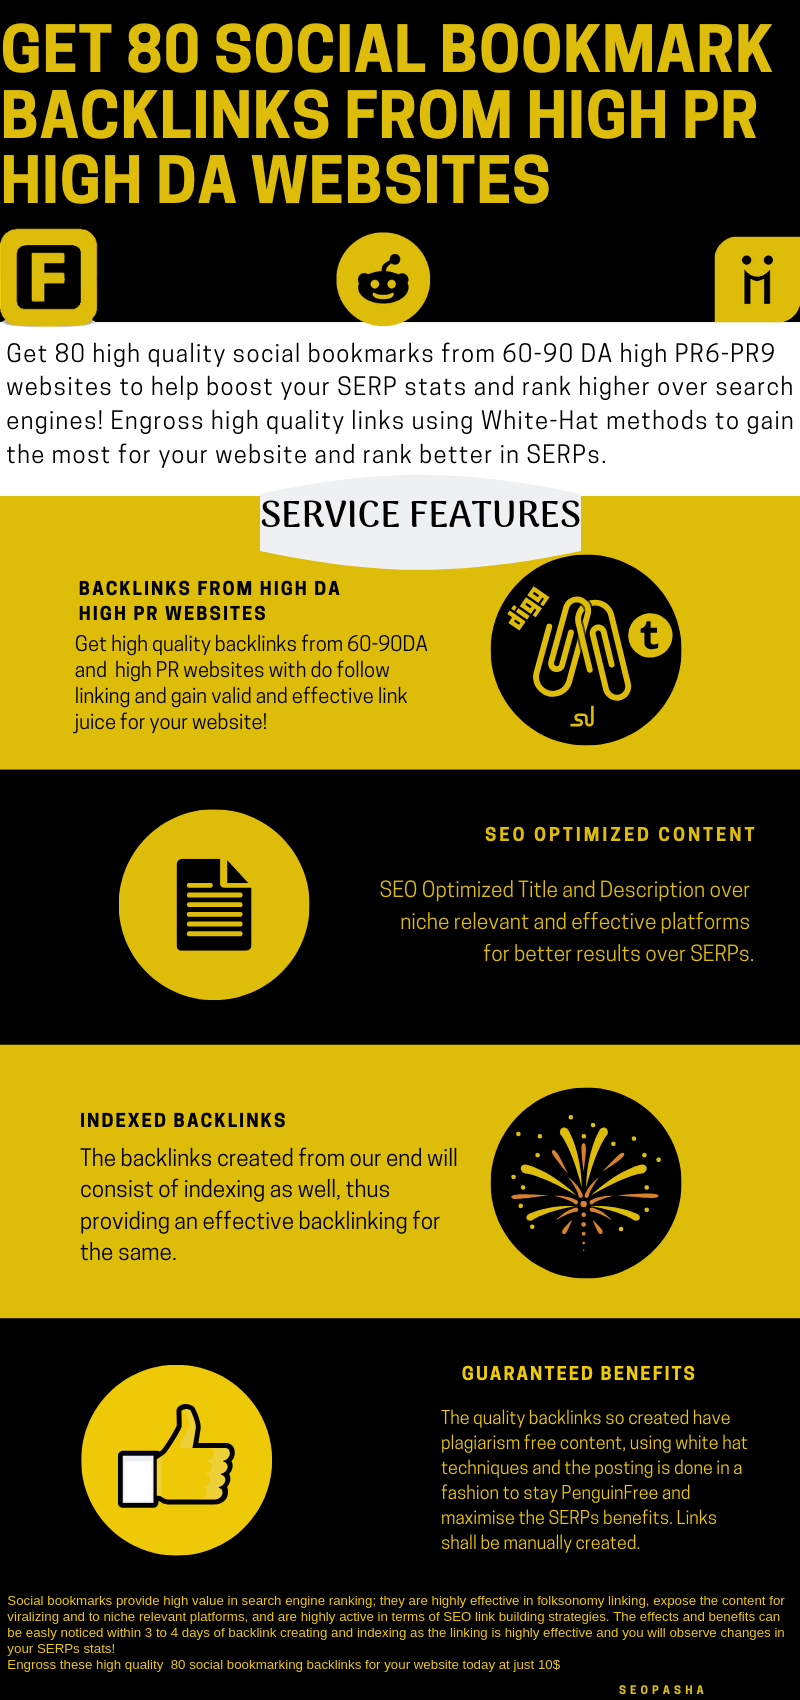 Get 80 high quality social bookmarking backlinks from high DA websites